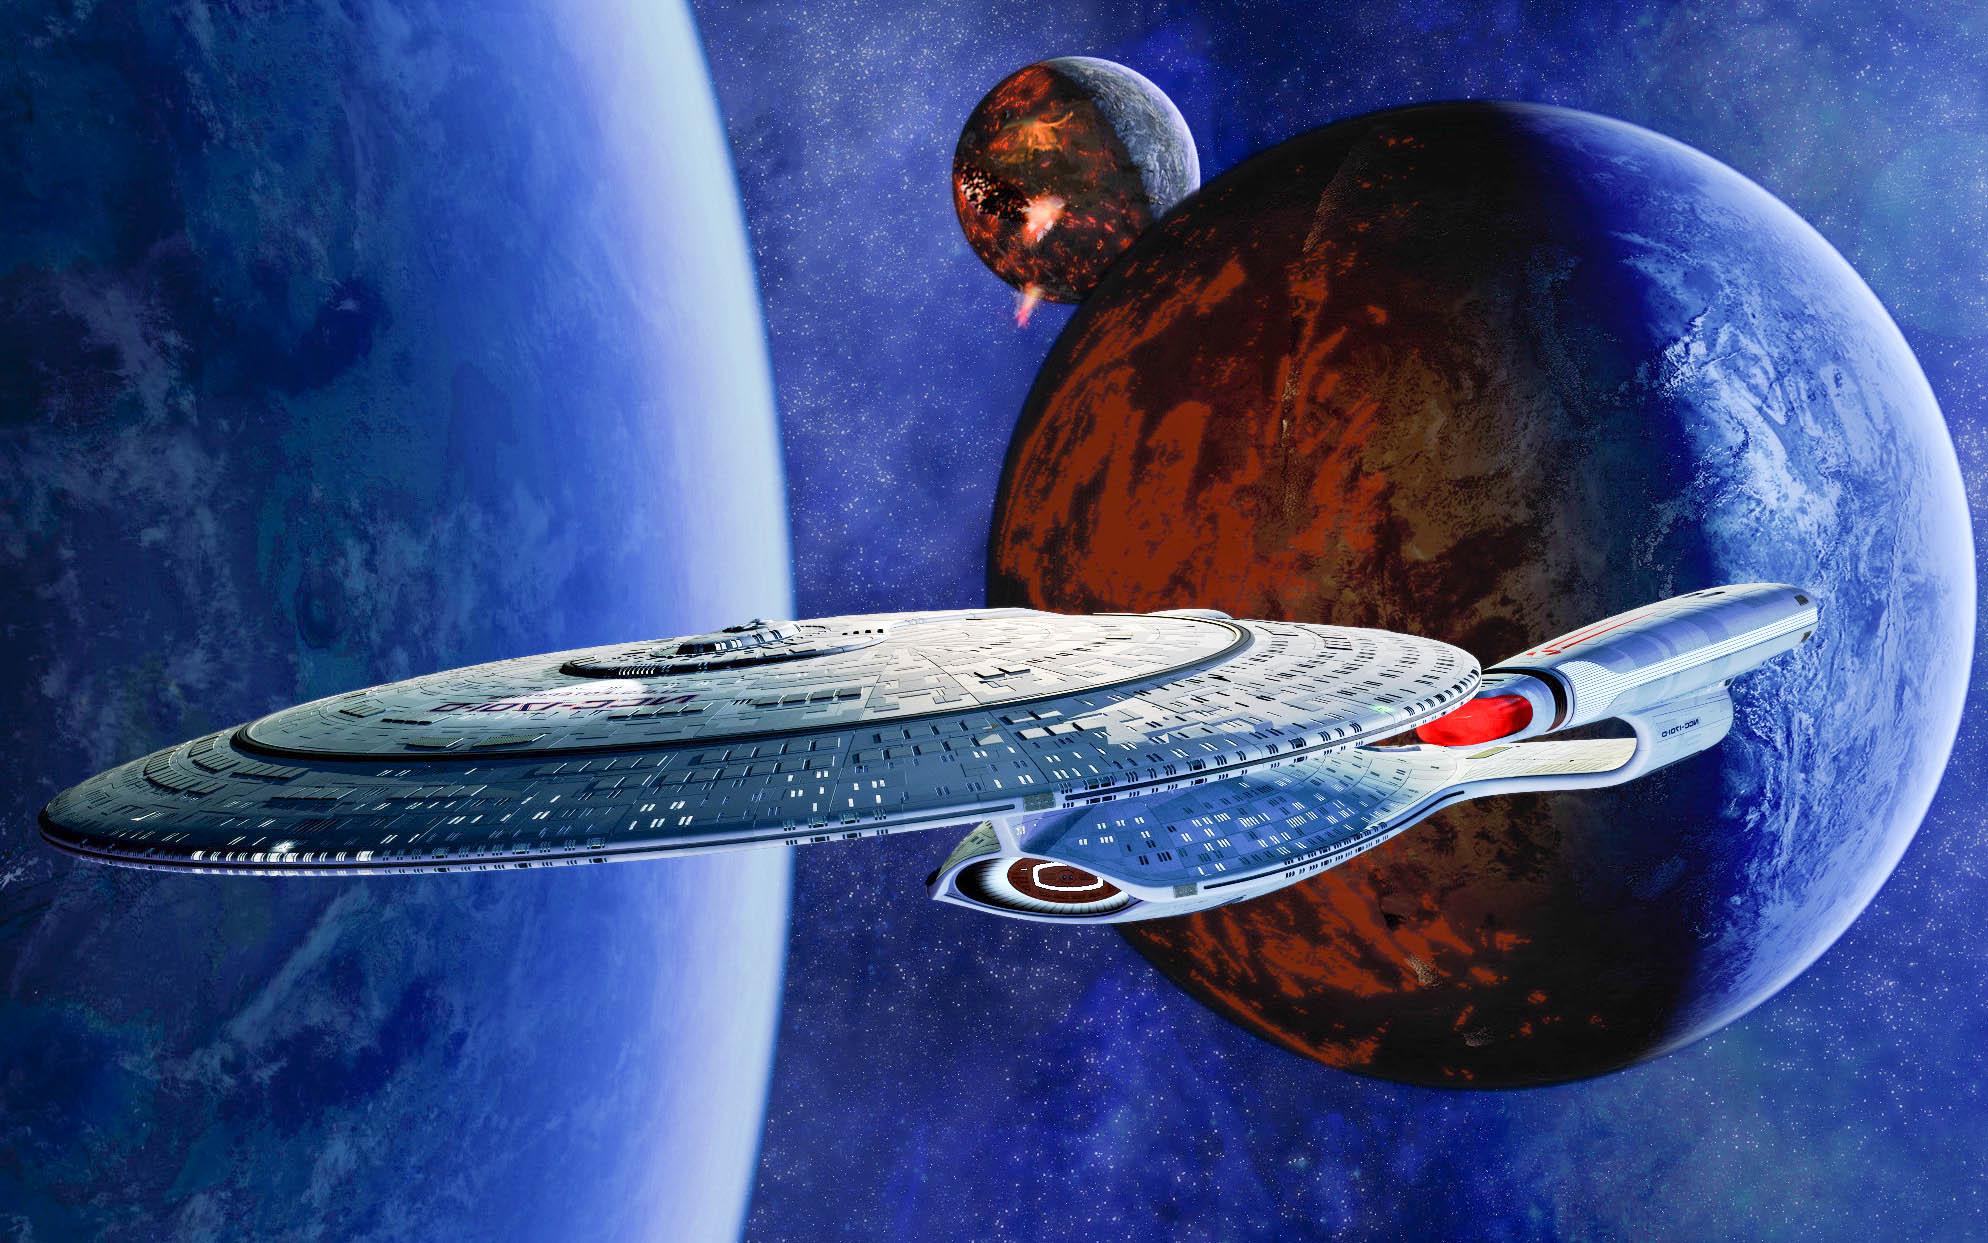 Star Trek The Original Series High Resolution Wallpapers 1988x1243